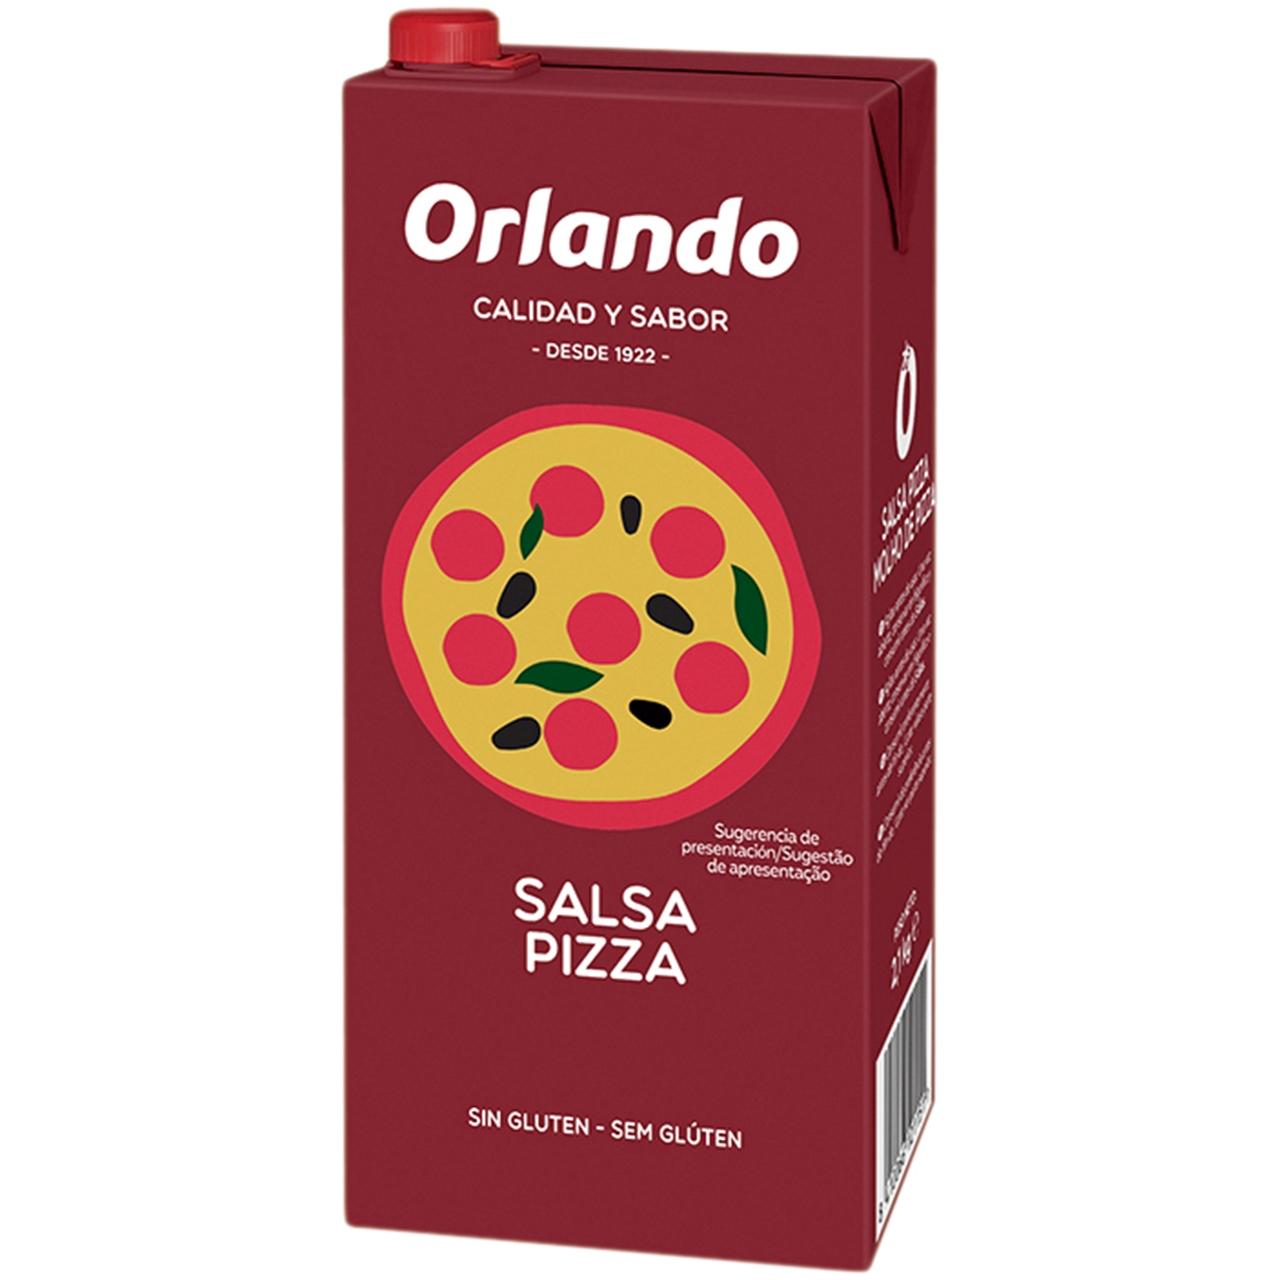 Salsa Pizza 2,1kg. Orlando